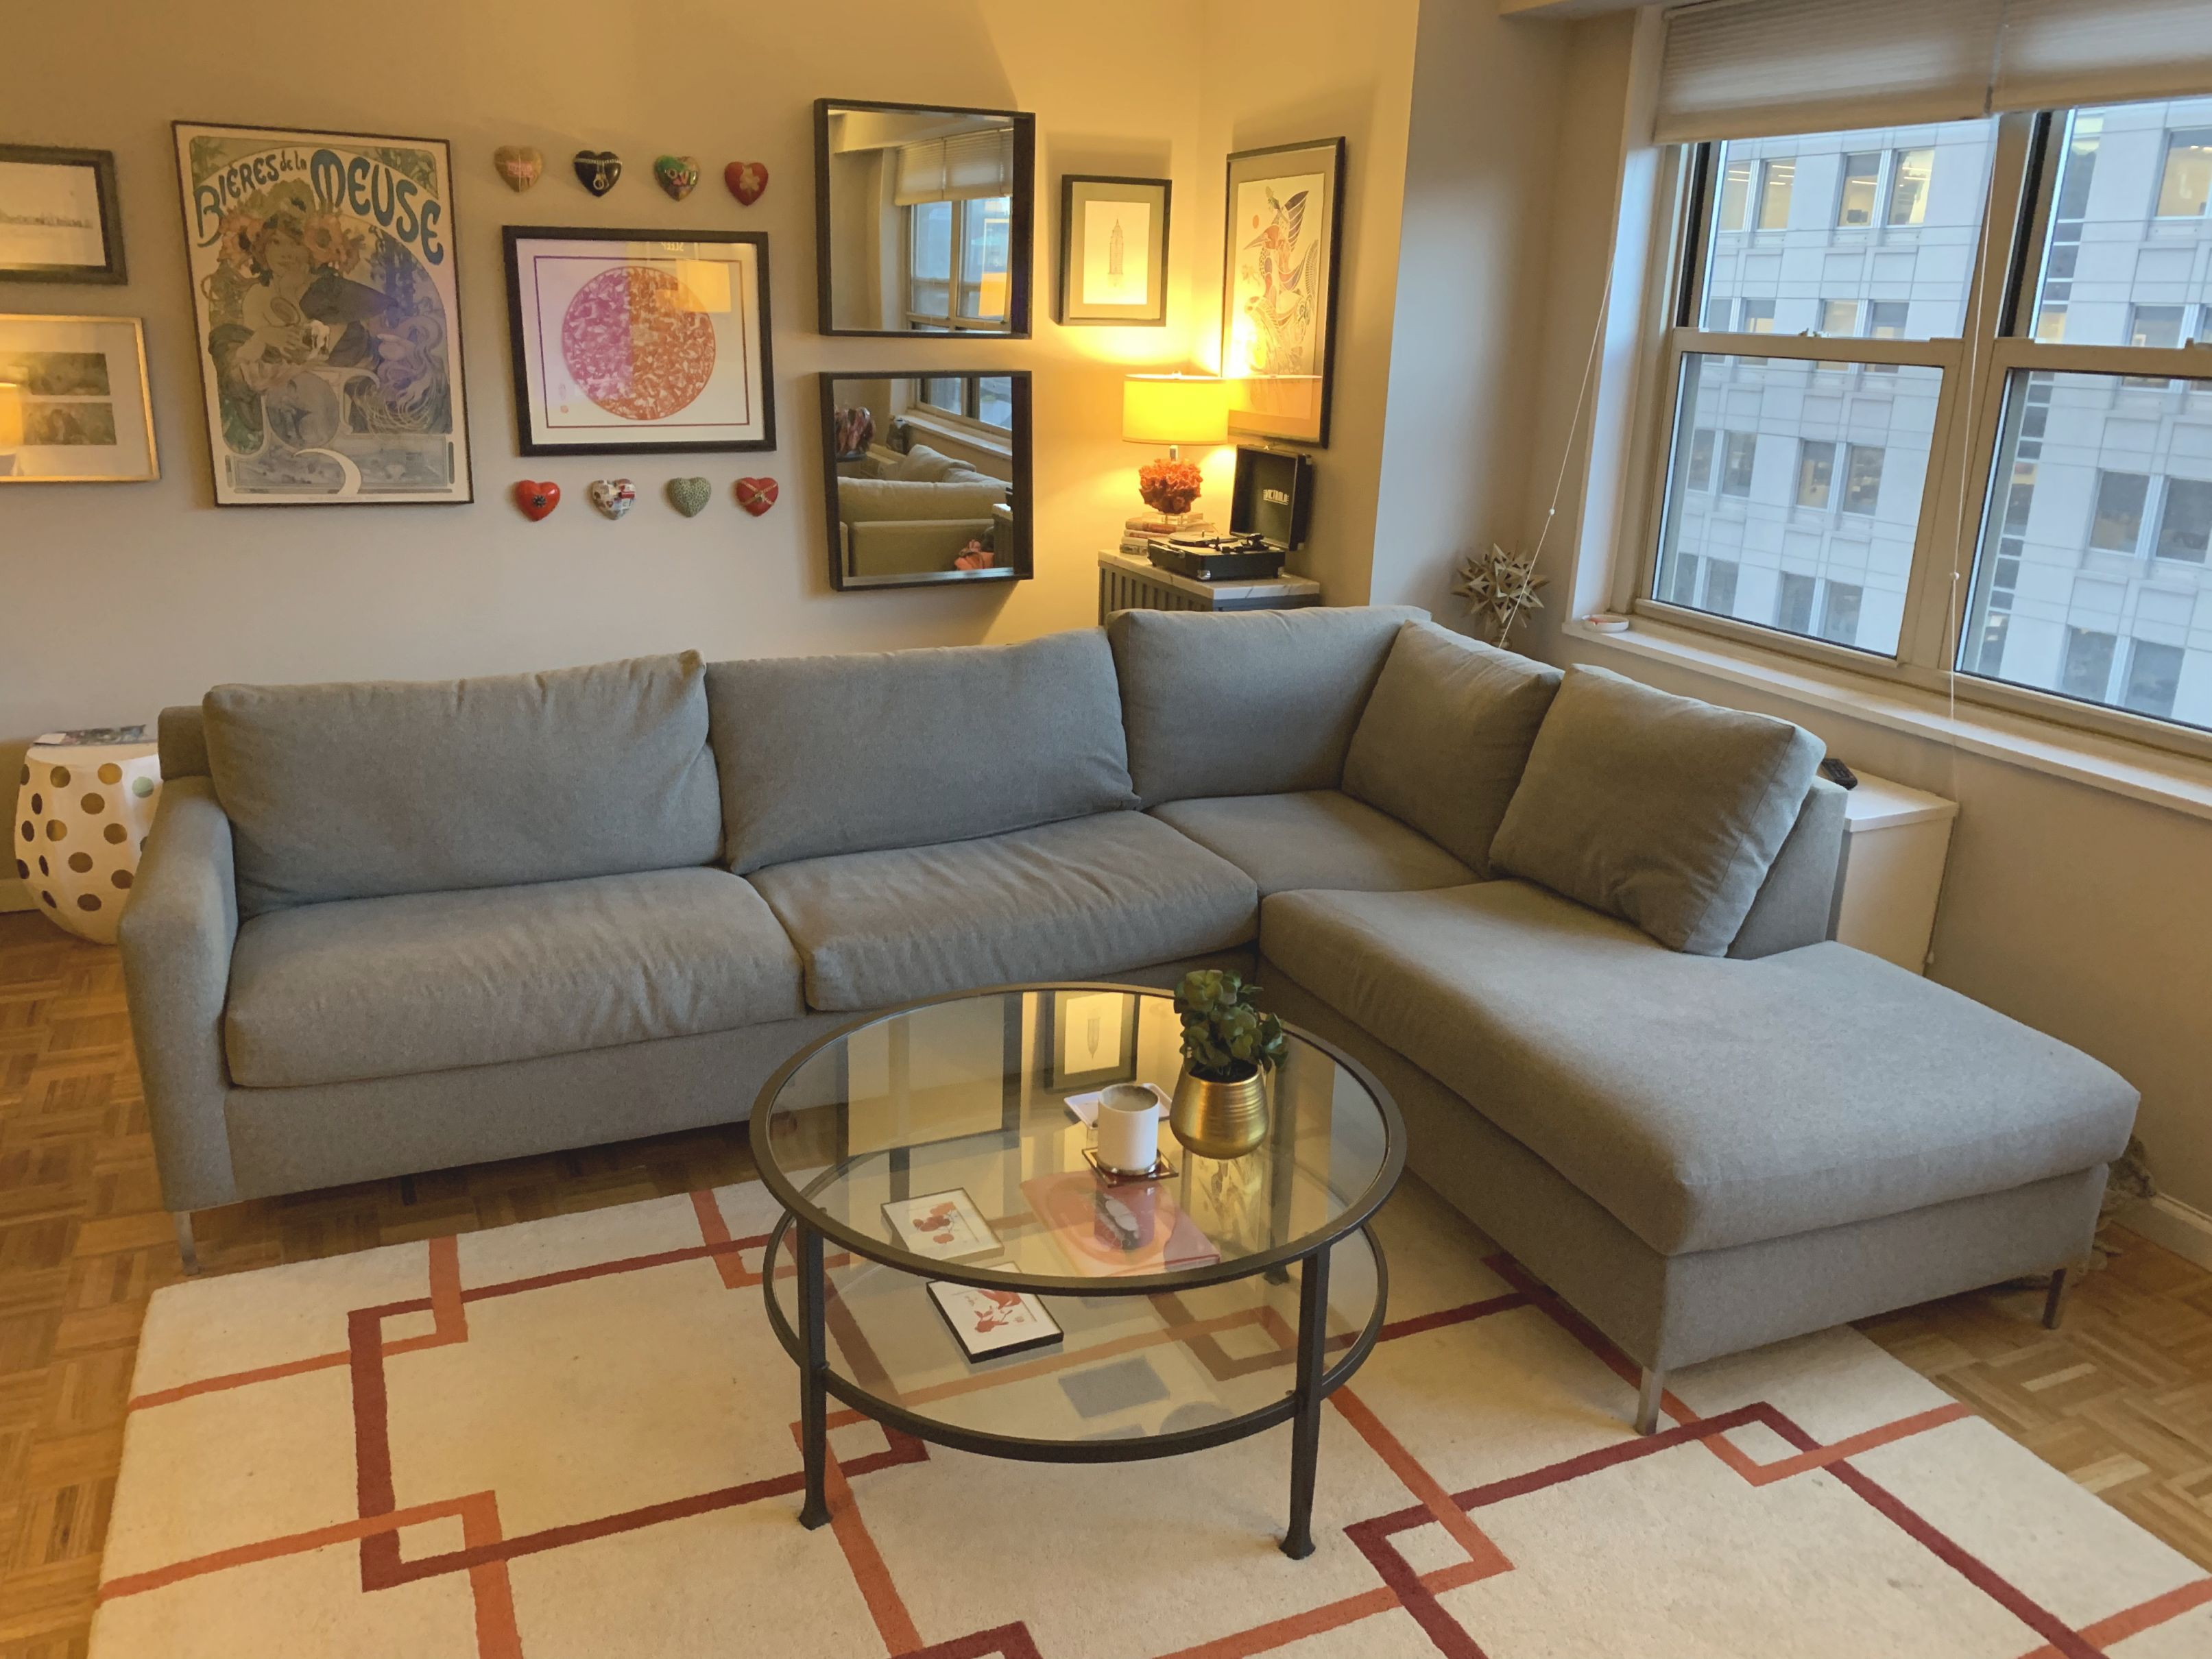 Raymour & Flanigan Sleeper Sofa With Chaise – Aptdeco within Raymour And Flanigan Sleeper Sofa